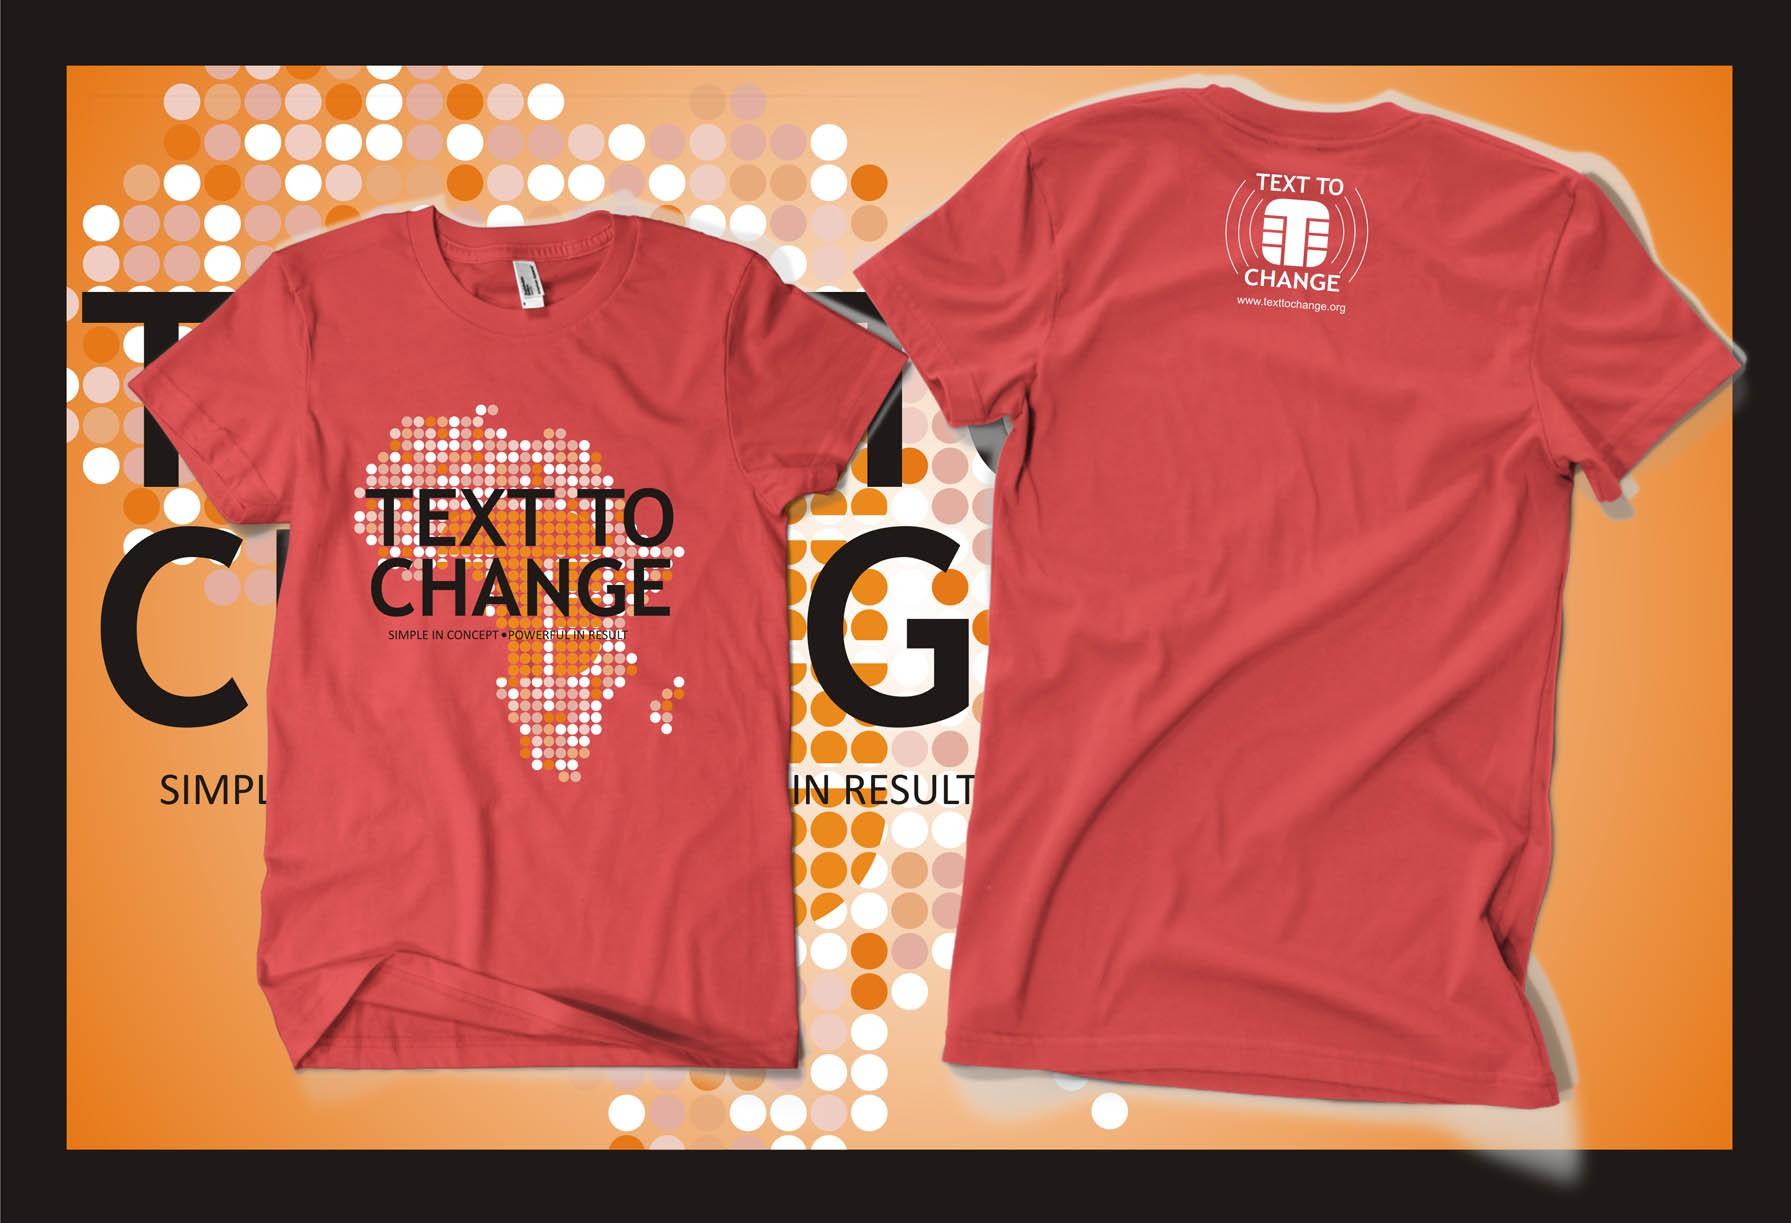 Text to Change  needs a new t-shirt design